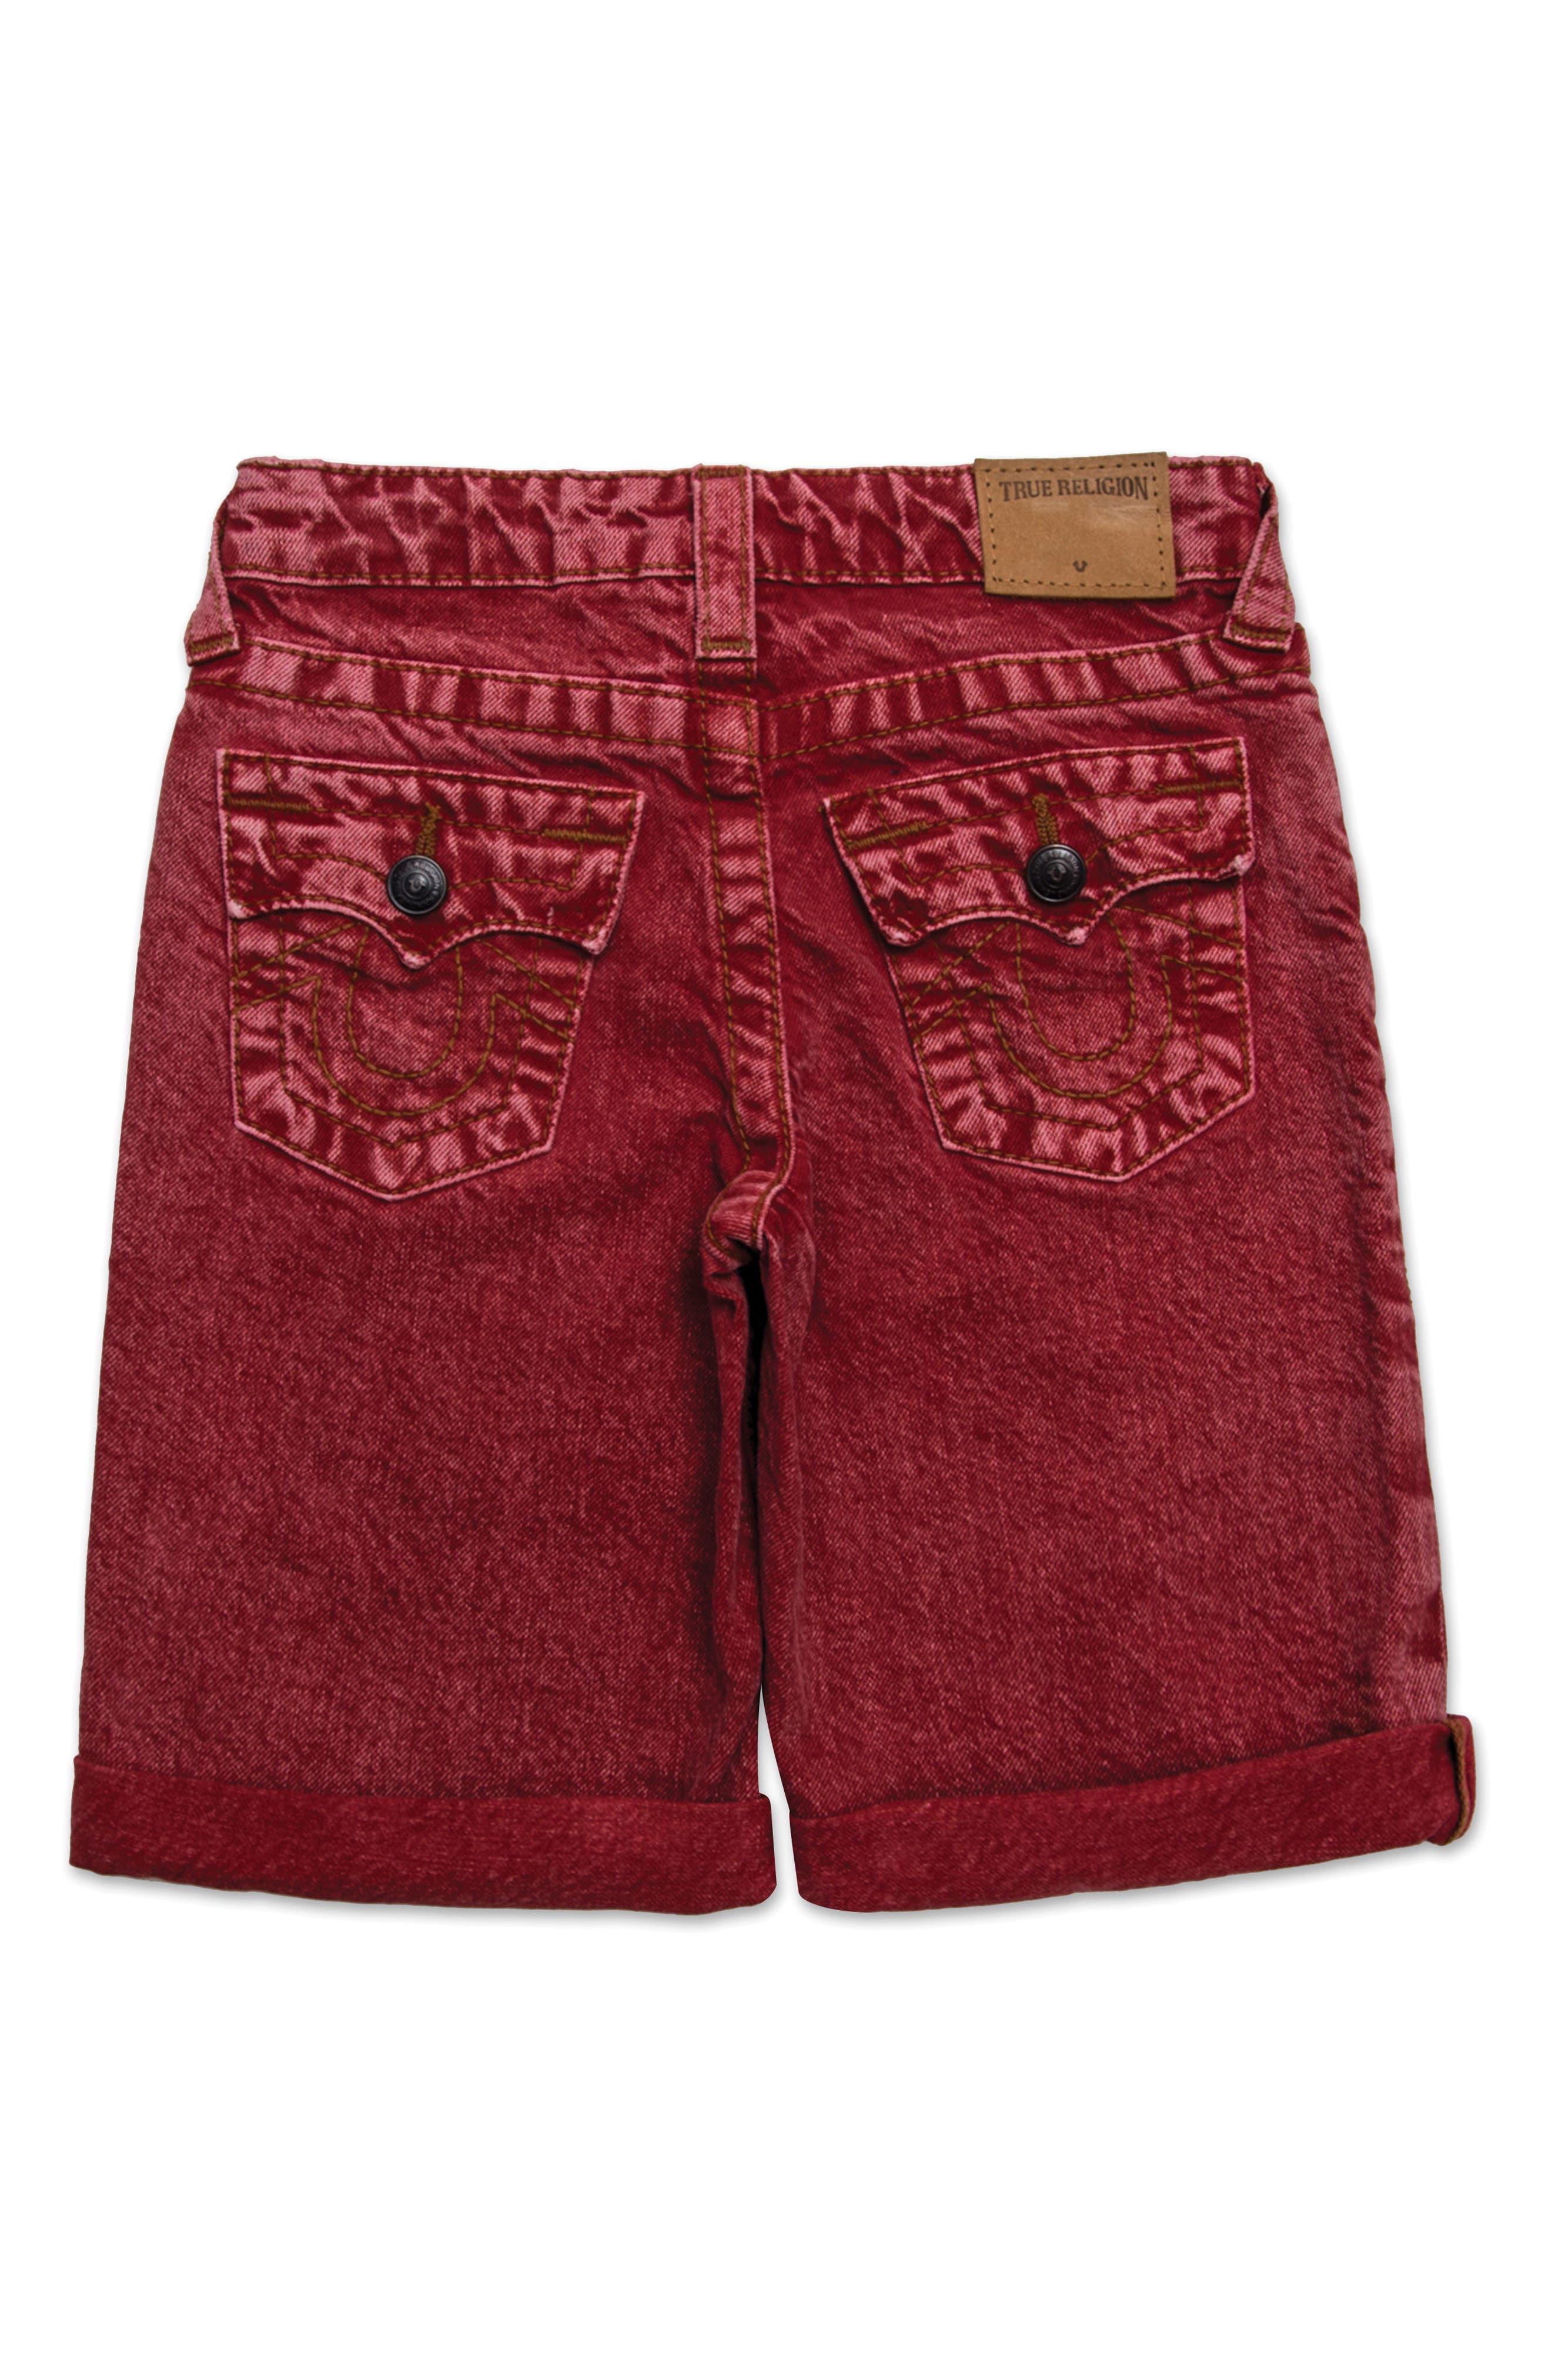 Geno Denim Shorts,                             Alternate thumbnail 2, color,                             Washed Red